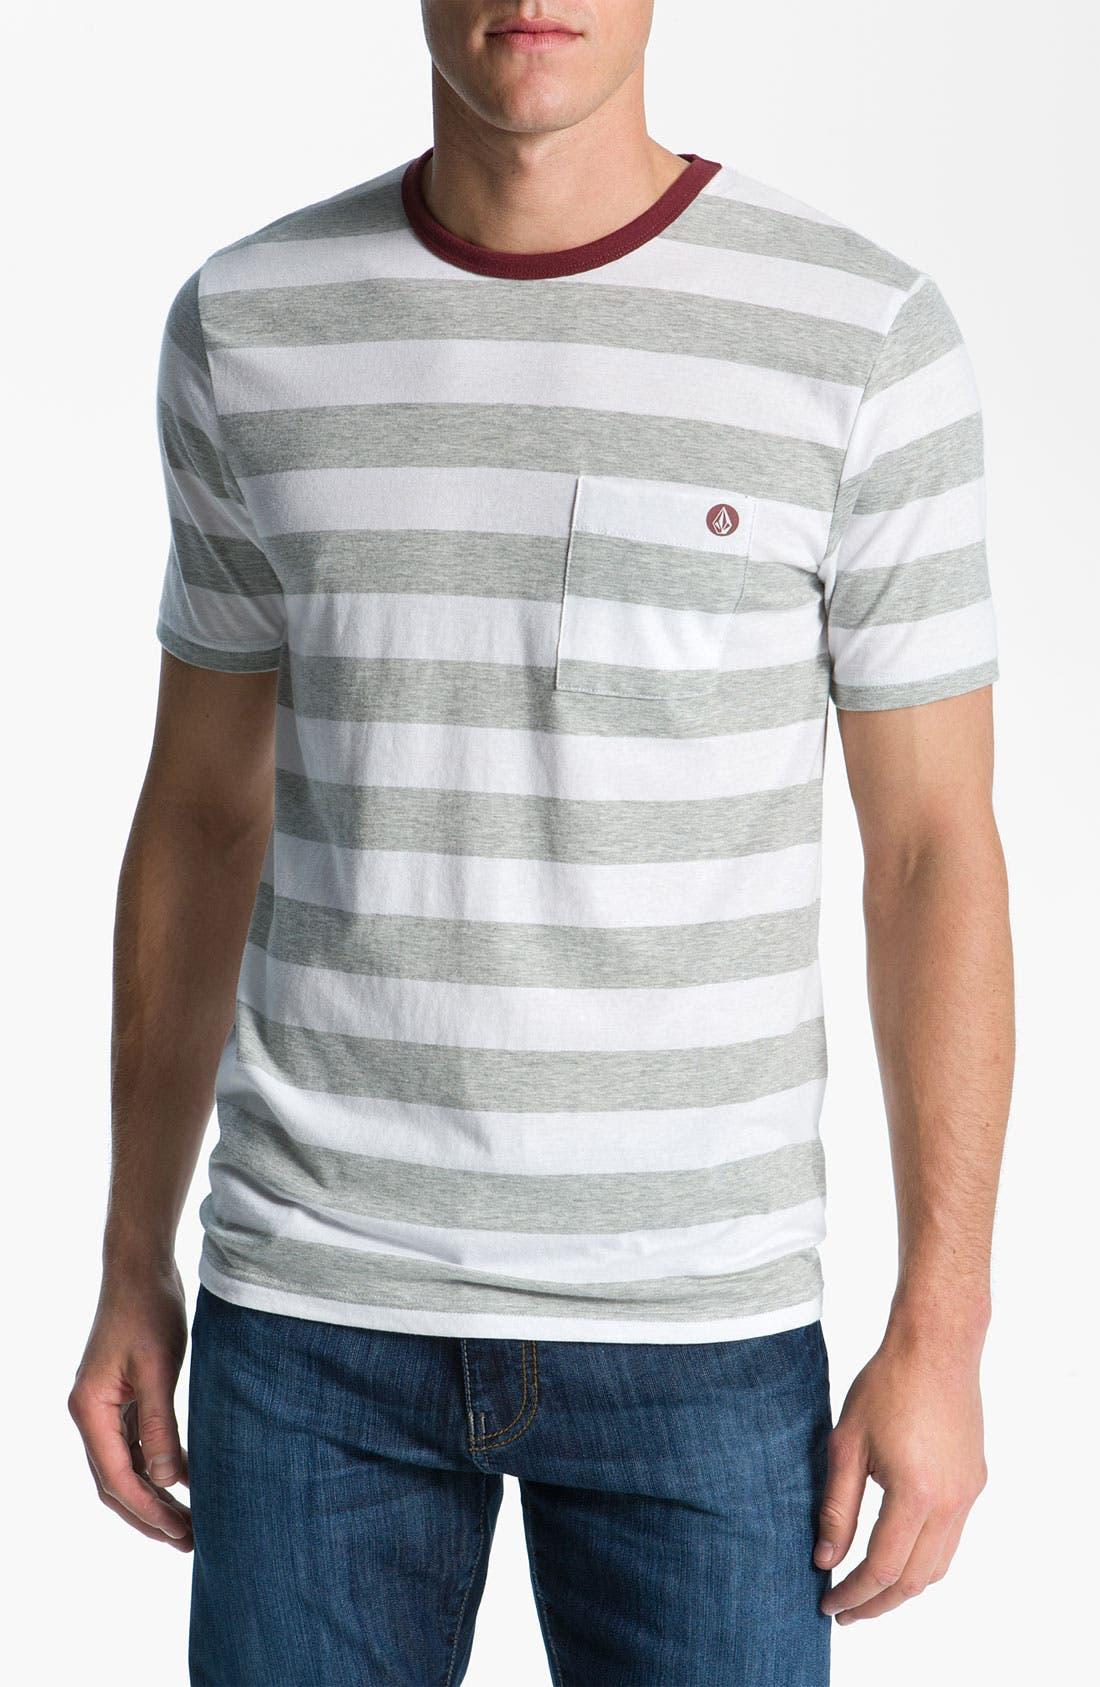 Main Image - Volcom 'Other Circle' T-Shirt